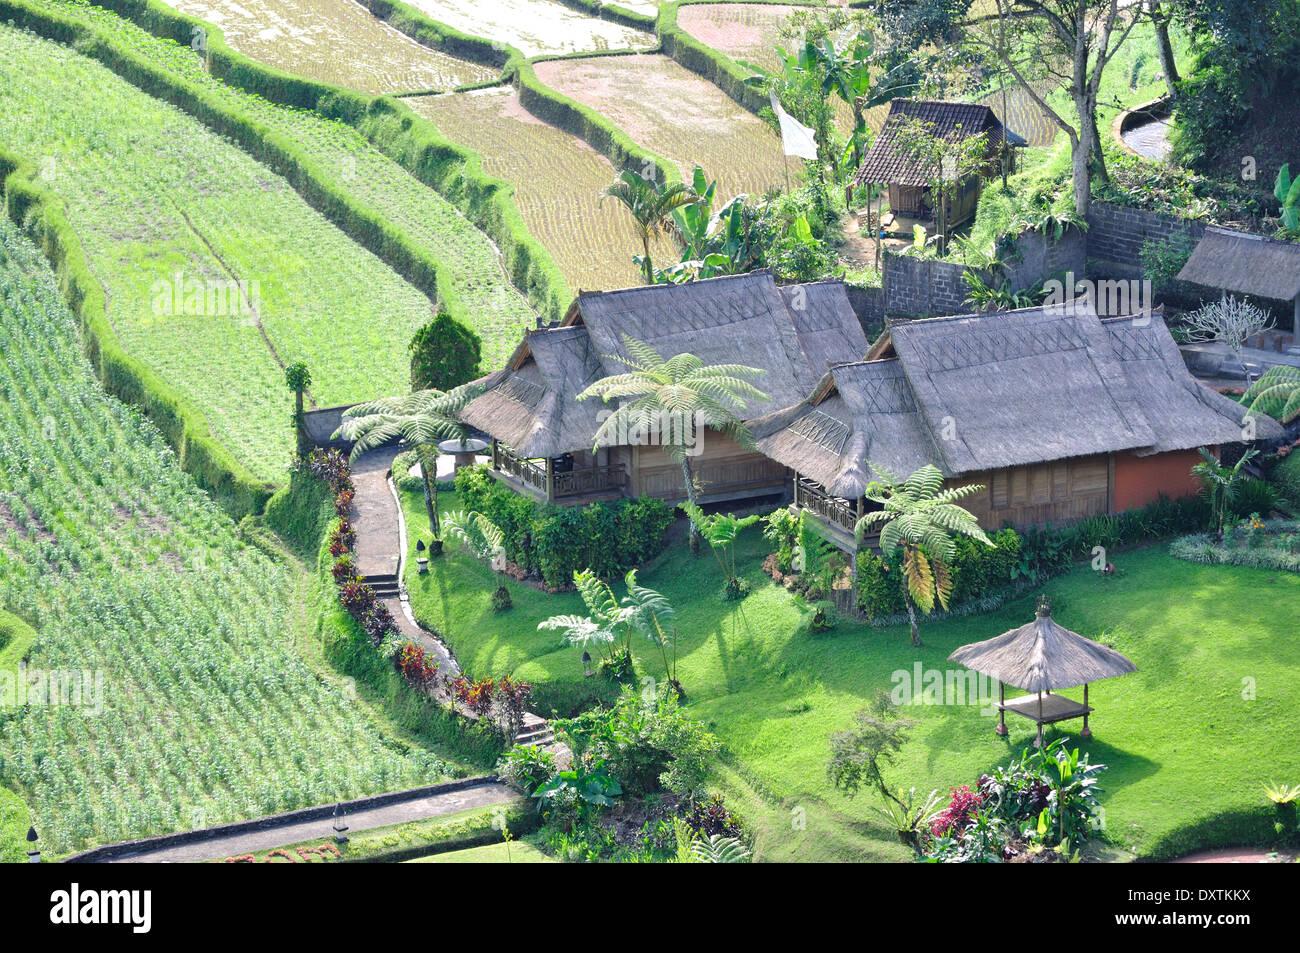 Traditionelles Dorf mit Reisfeld in Insel Bali, Indonesien. Stockbild